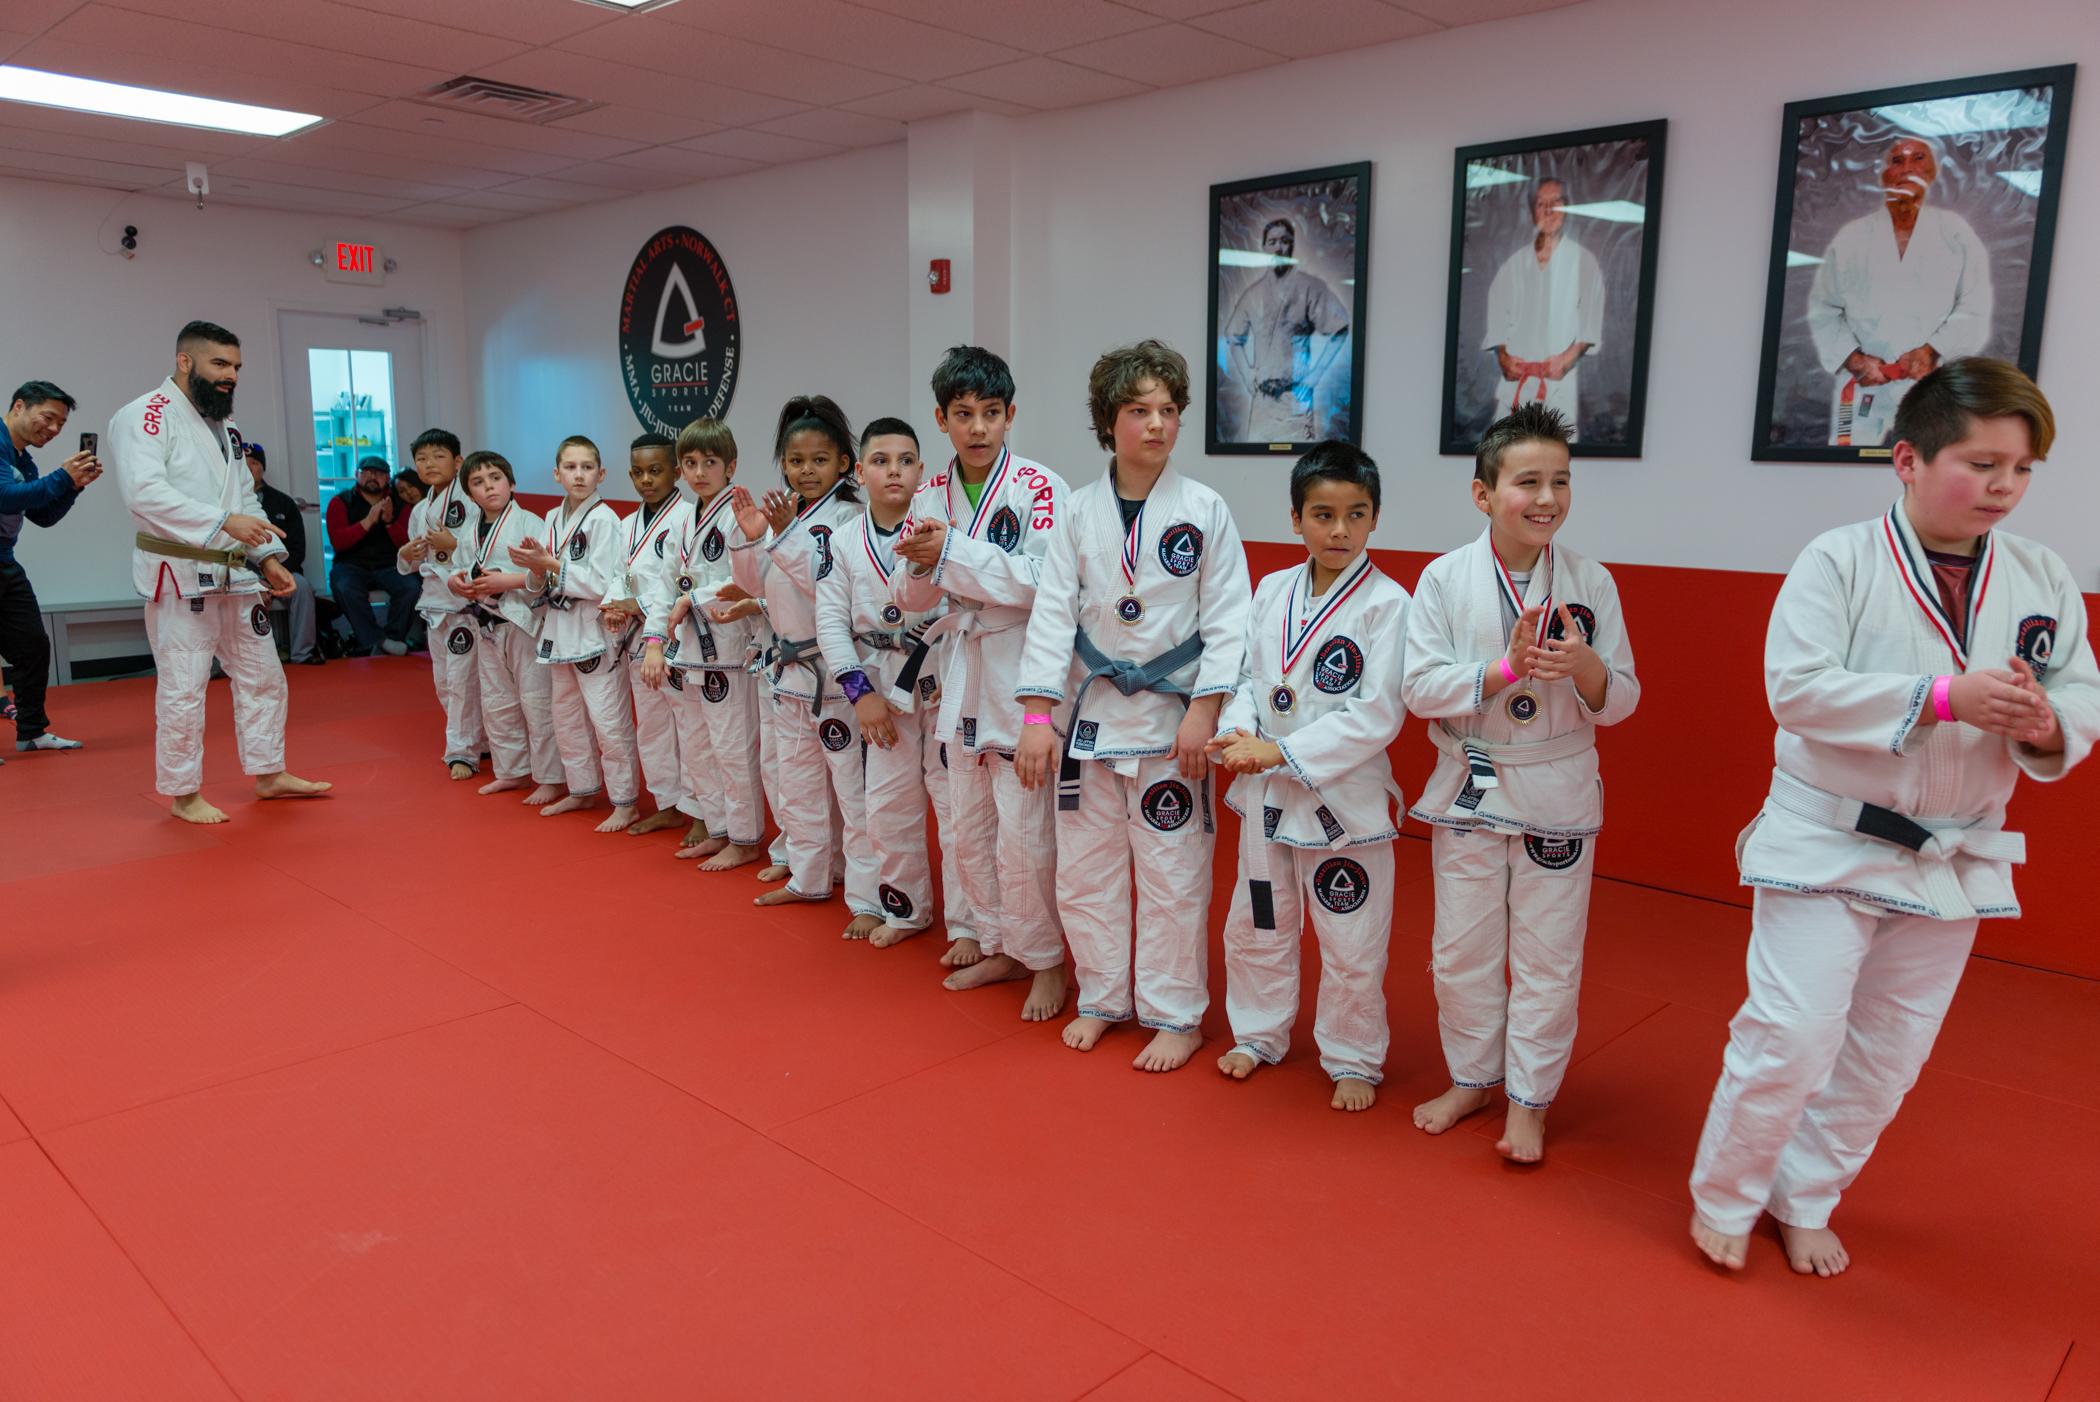 Gracie-Sports-Kids-102.jpg